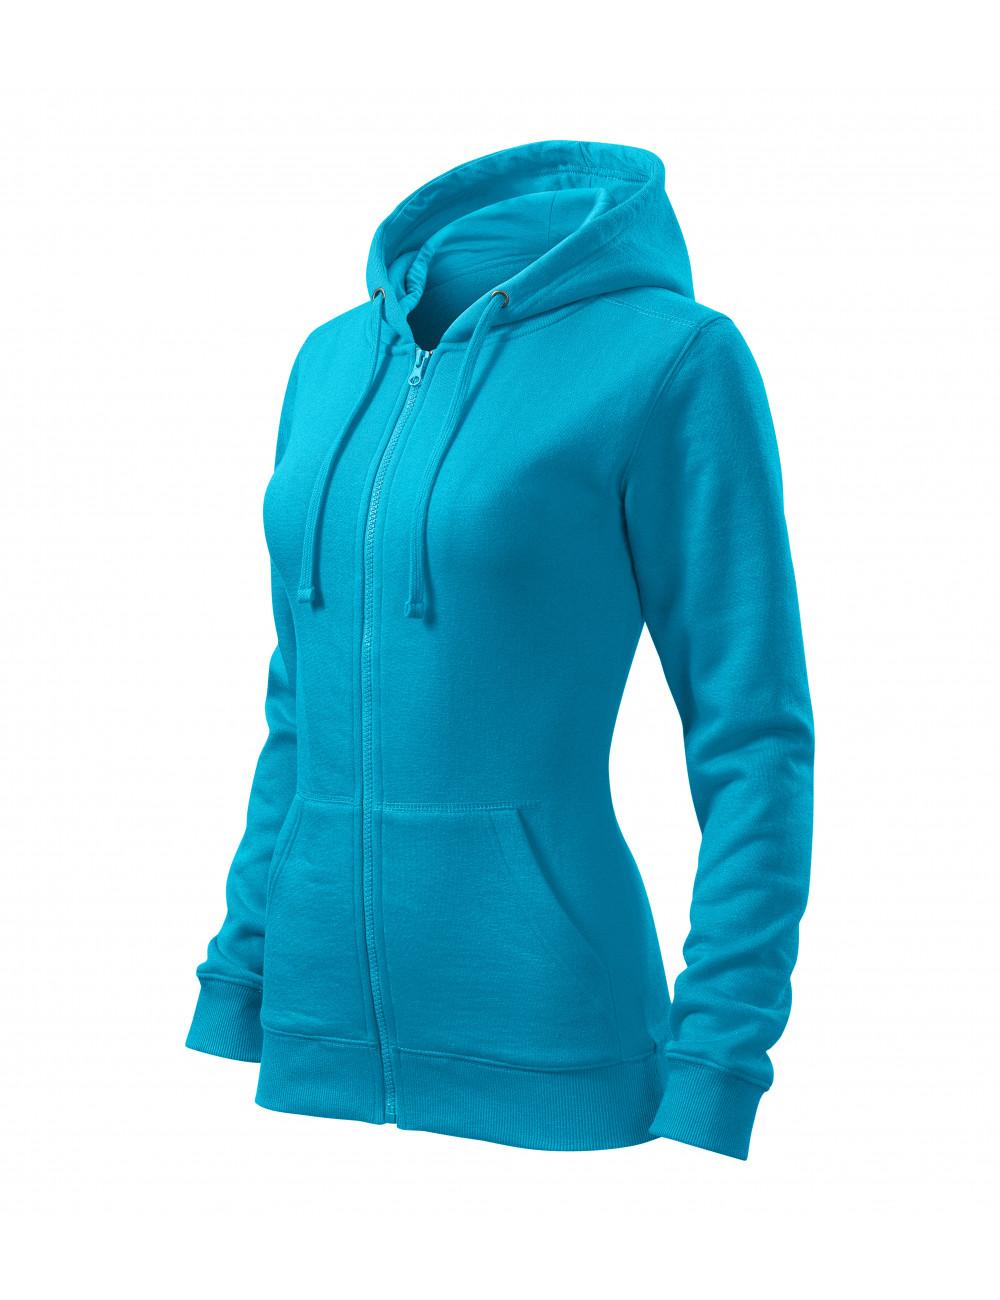 Adler MALFINI Bluza damska Trendy Zipper 411 turkus